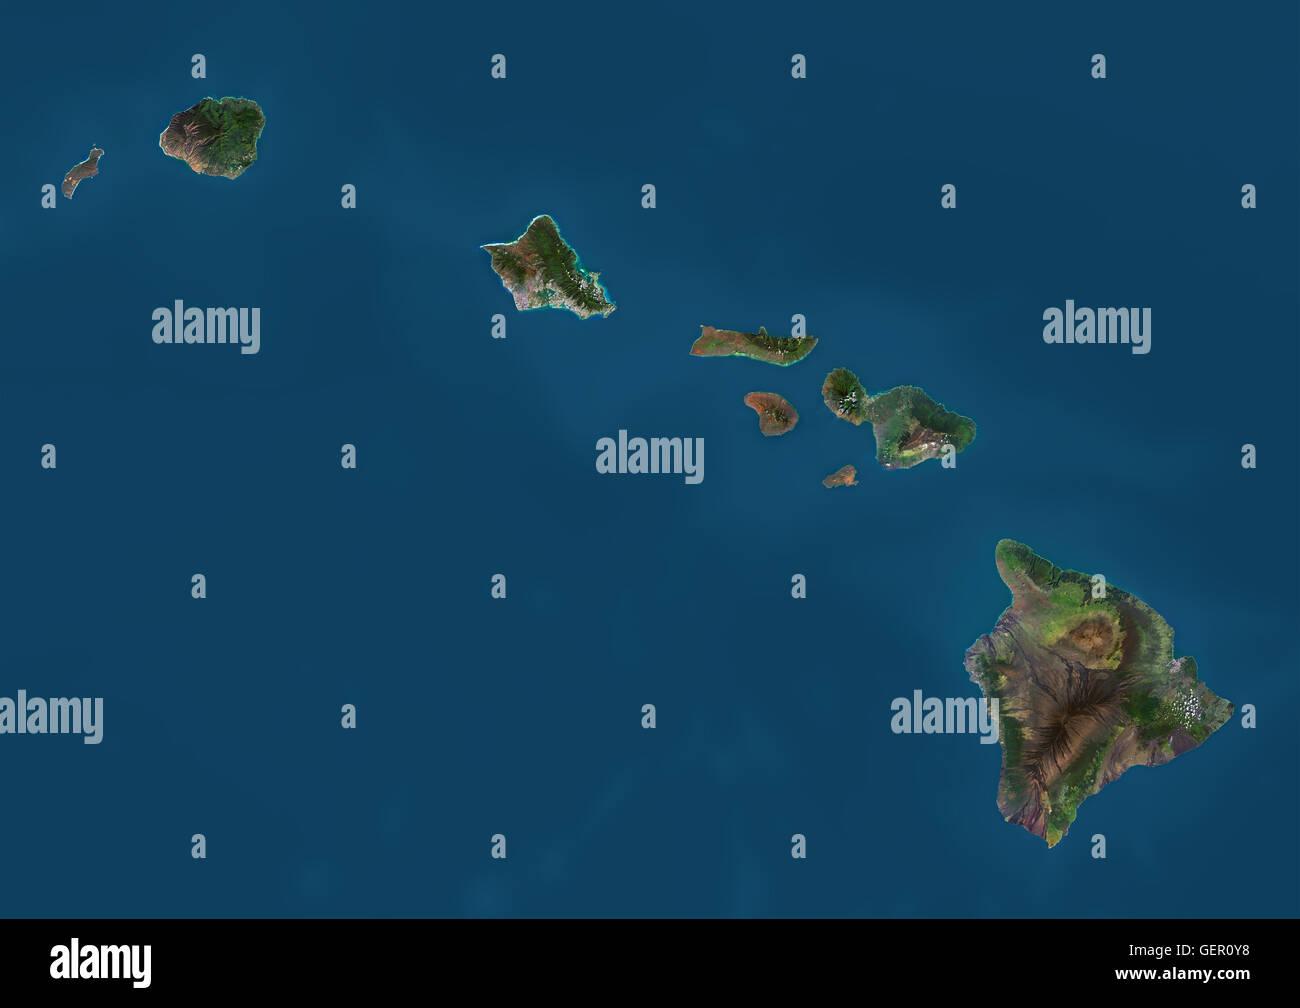 Hawaii Islands Map Stock Photos & Hawaii Islands Map Stock ... on blank us map including alaska and hawaii, map from usa to hawaii, map showing hawaii, blank indiana map, blank florida map, outline of hawaii, blank town map, blank map canada and alaska, street map oahu hawaii, blank world map, size of hawaii, blank wisconsin map, blank texas map, blank island map, blank georgia map, blank us map with alaska and hawaii, blank rpg maps, blank oklahoma map, blank oahu map, detailed map kona hawaii,